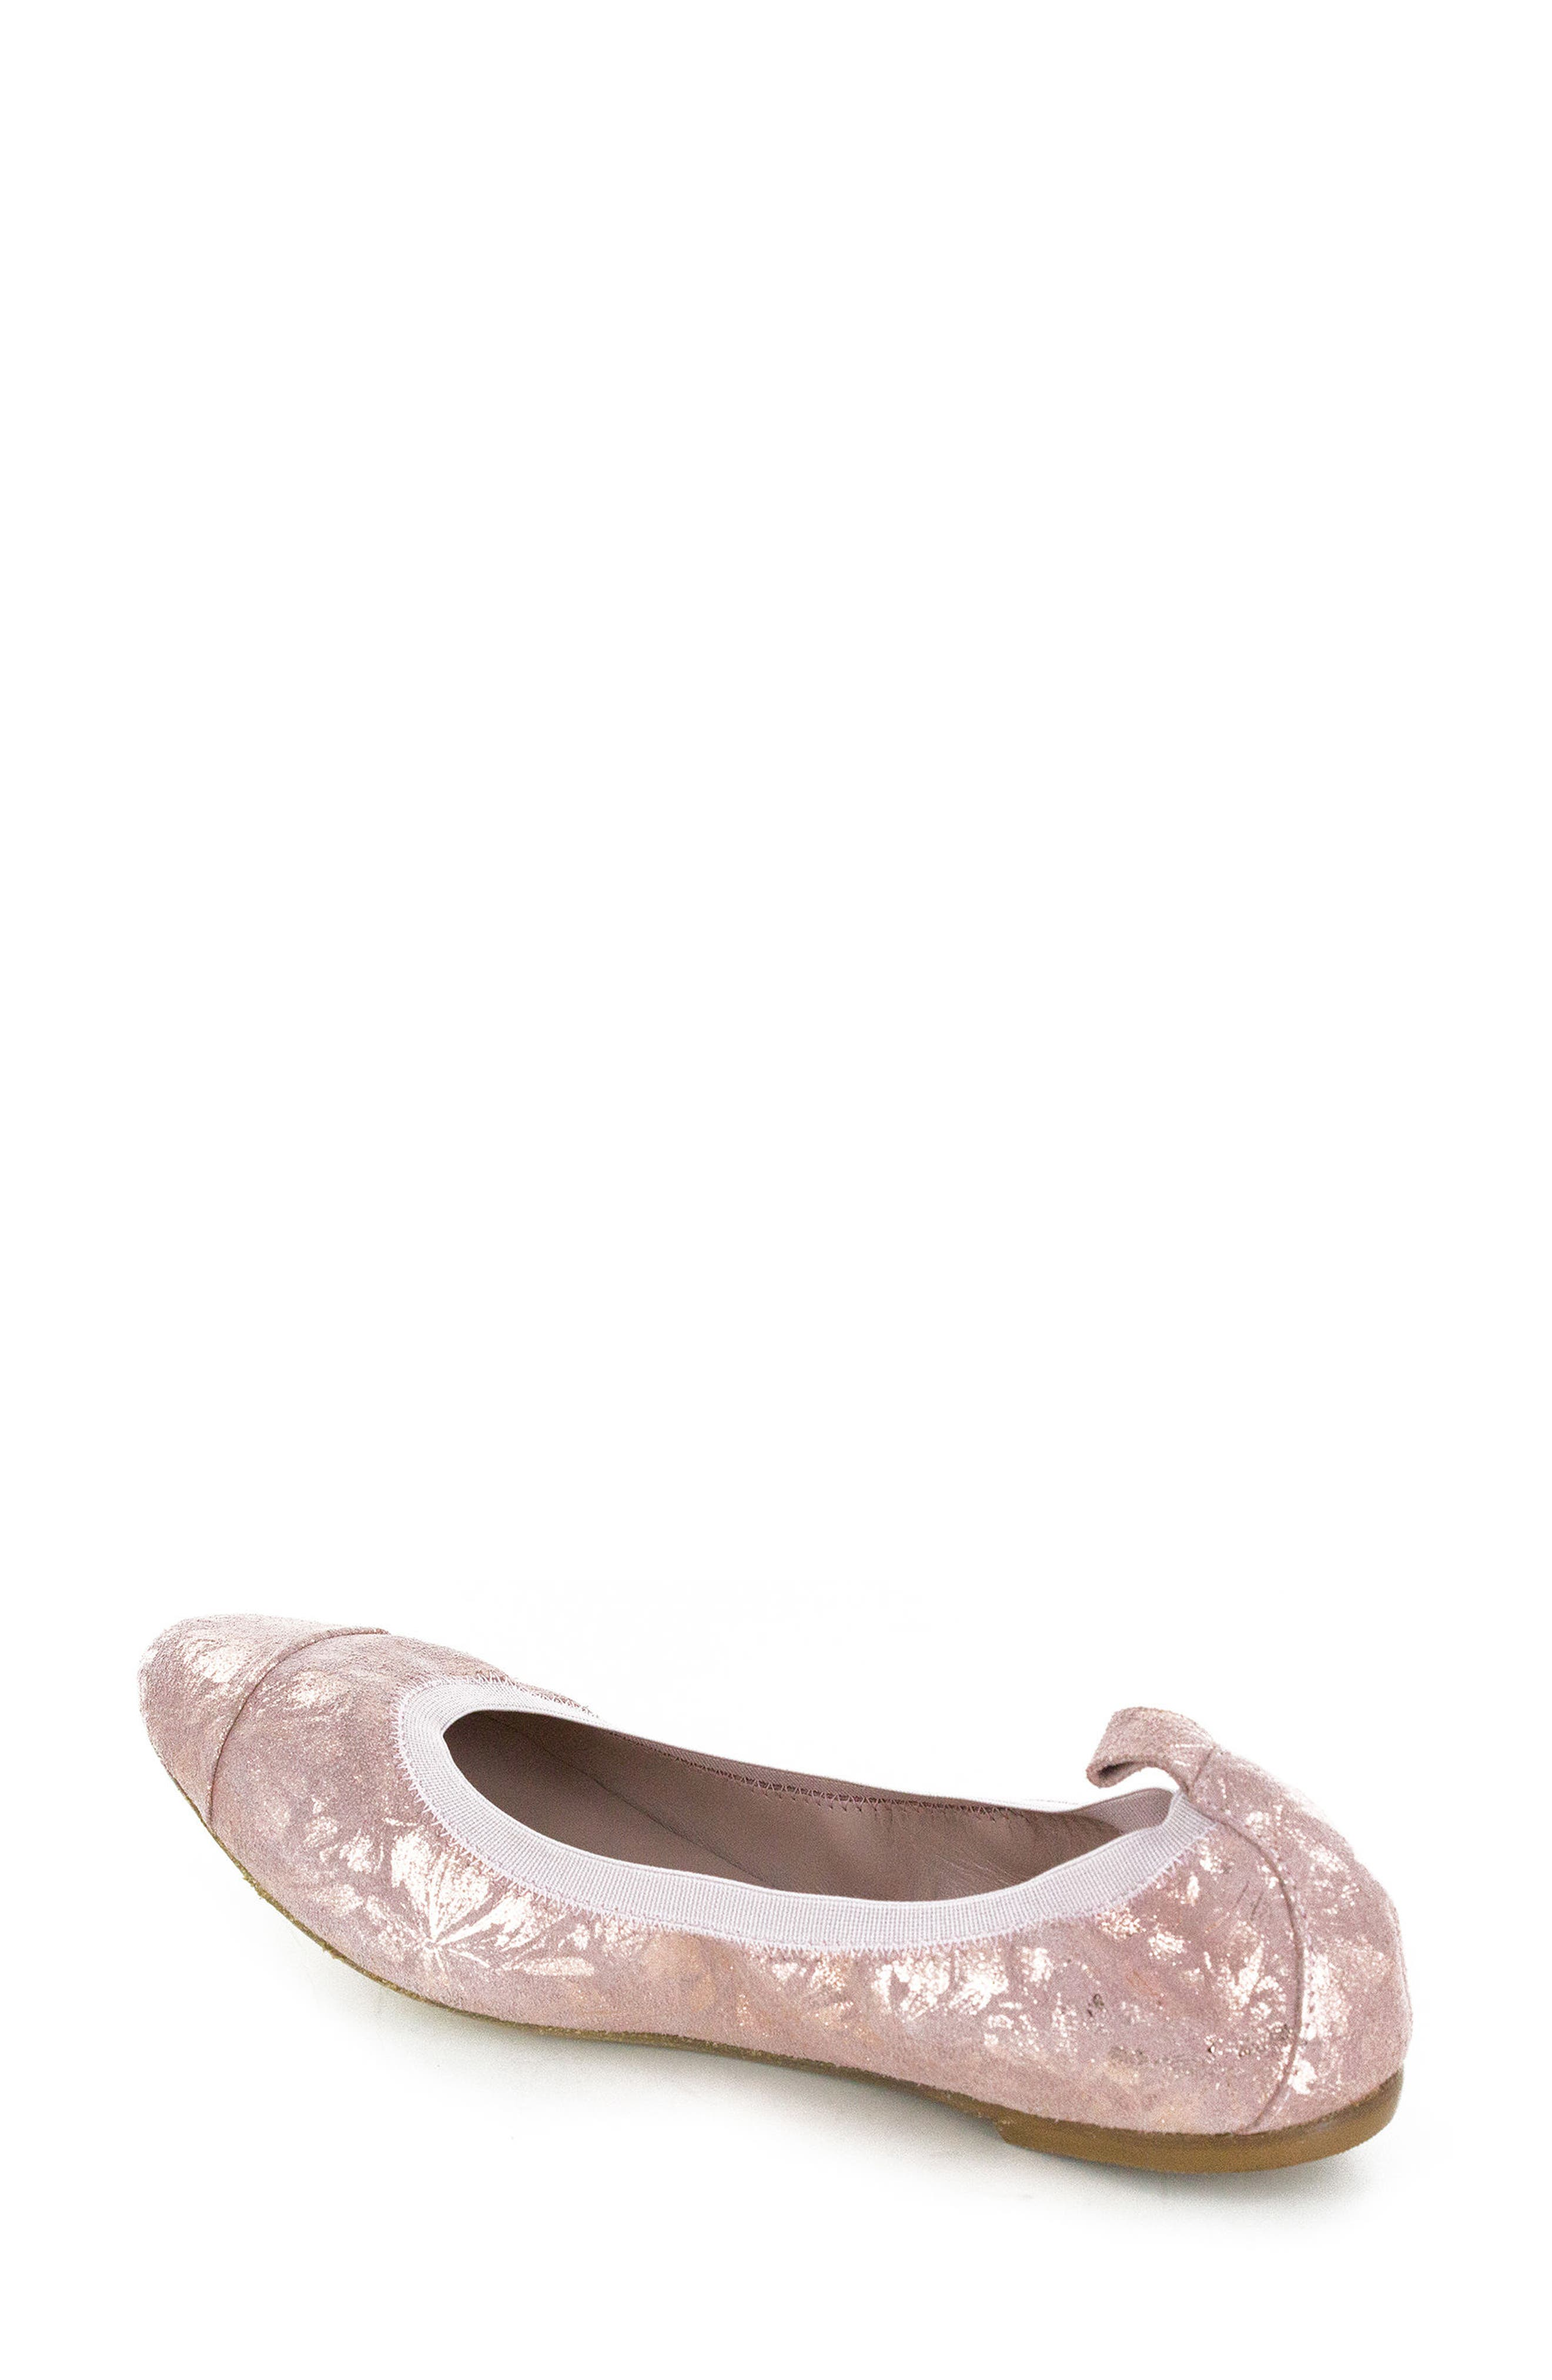 Kara Ballet Flat,                             Alternate thumbnail 2, color,                             Rose Quartz Floral Leather